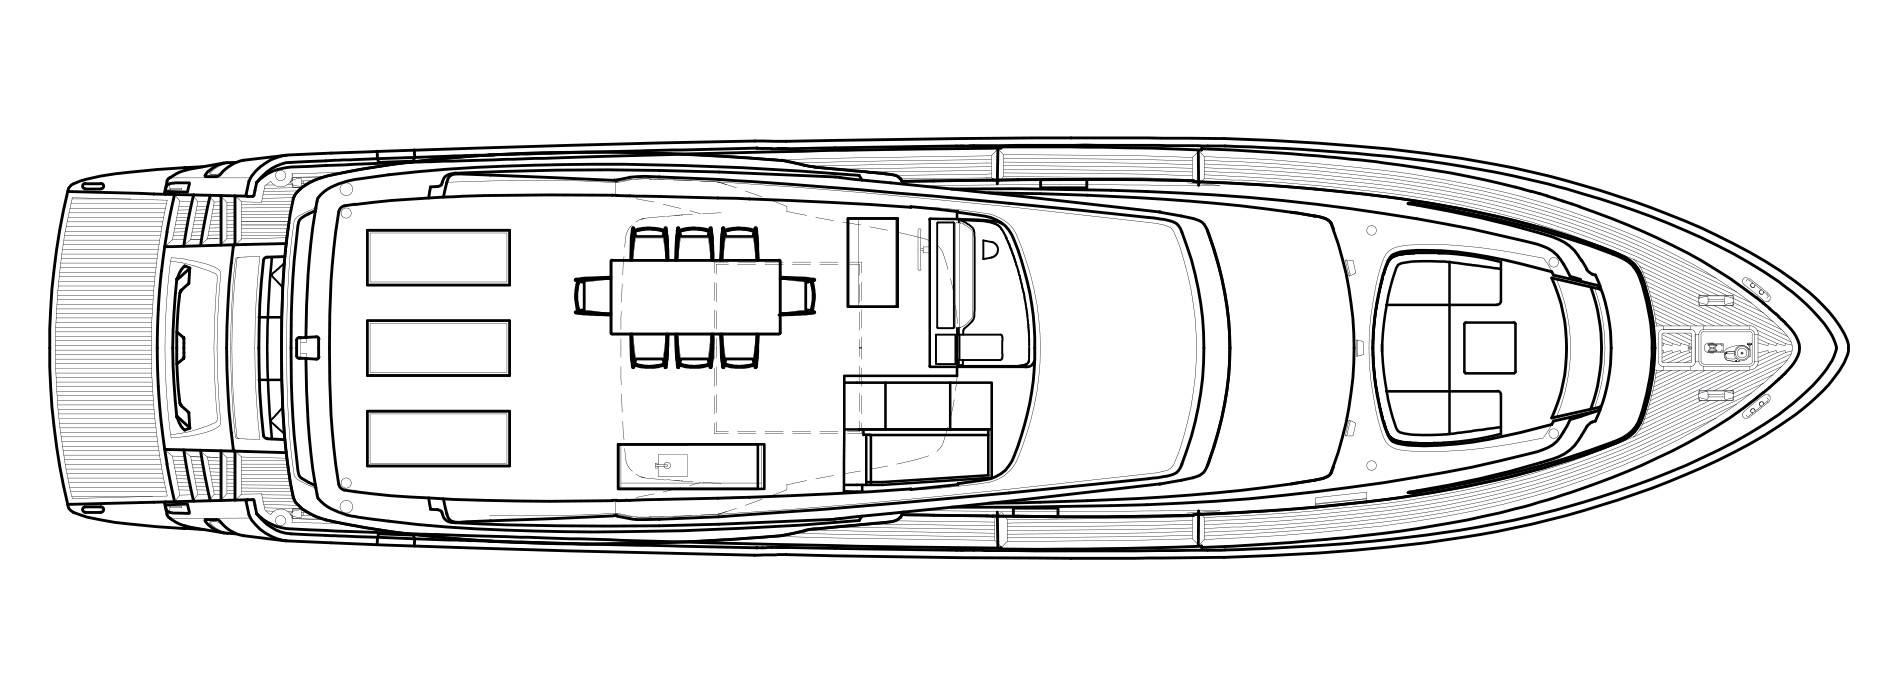 Sanlorenzo Yachts SL78 Flying bridge